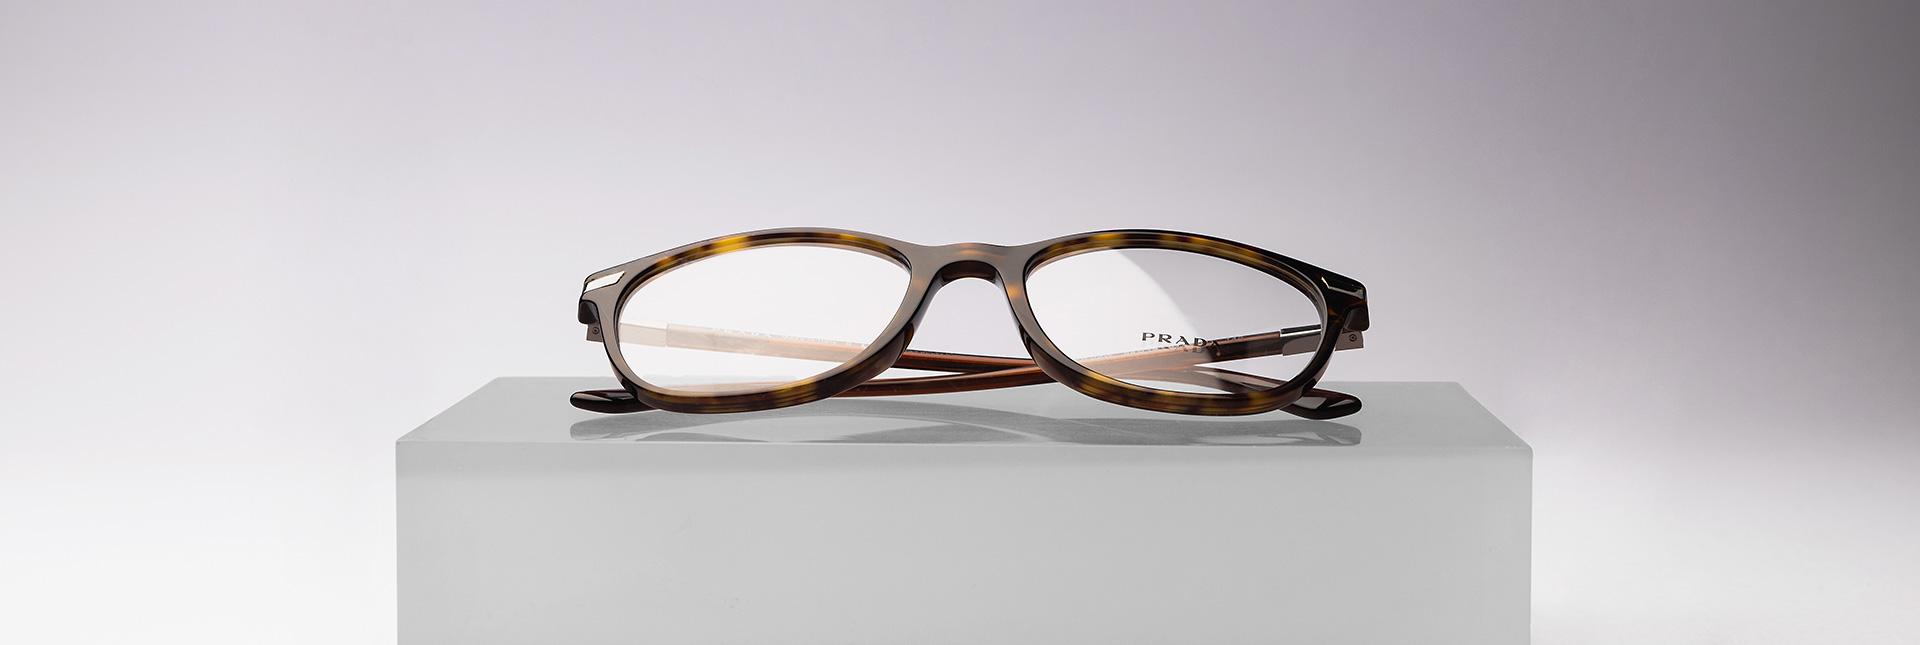 Prada® Eyeglasses